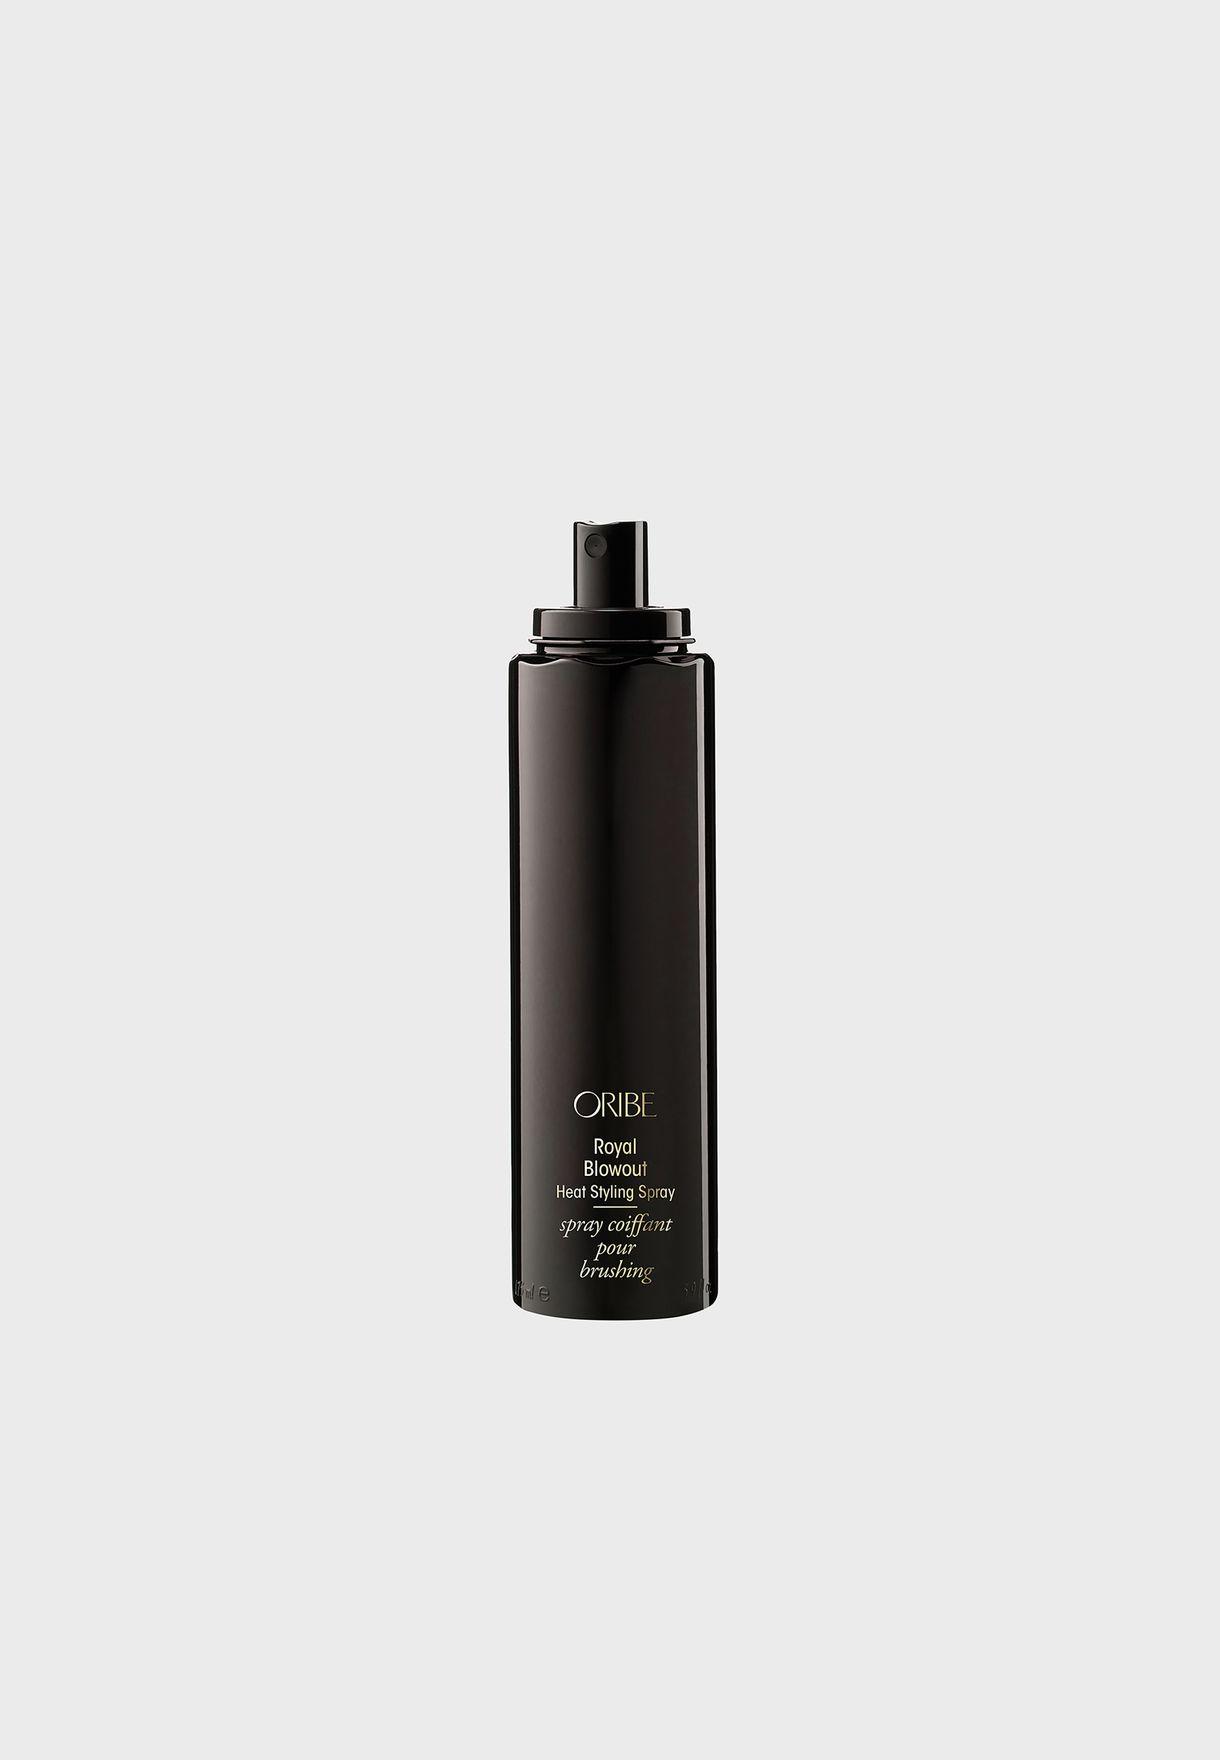 Royal Blowout Heat Styling Spray 175ml